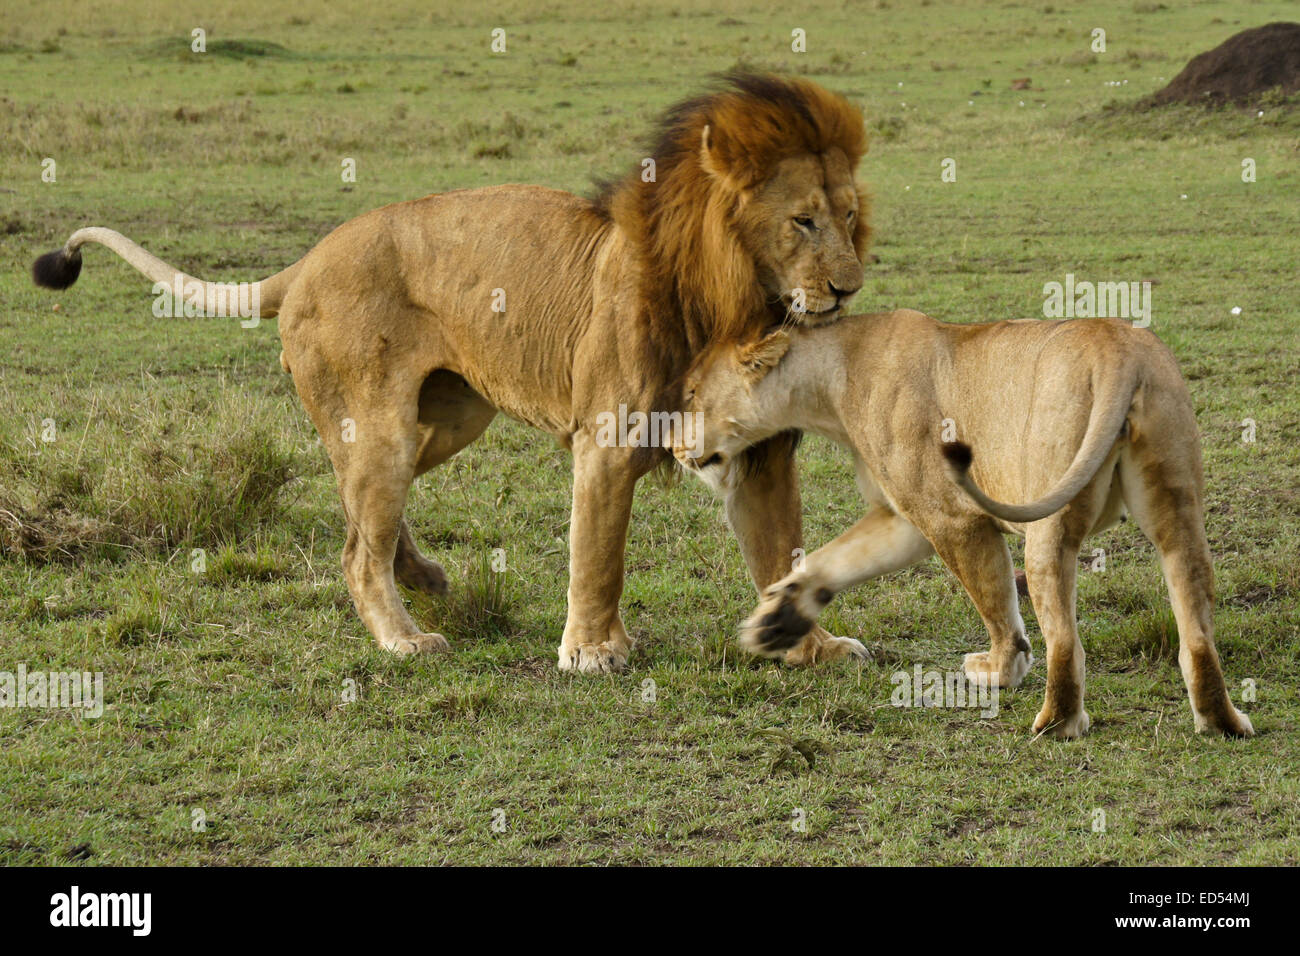 Lions courting, Masai Mara, Kenya - Stock Image